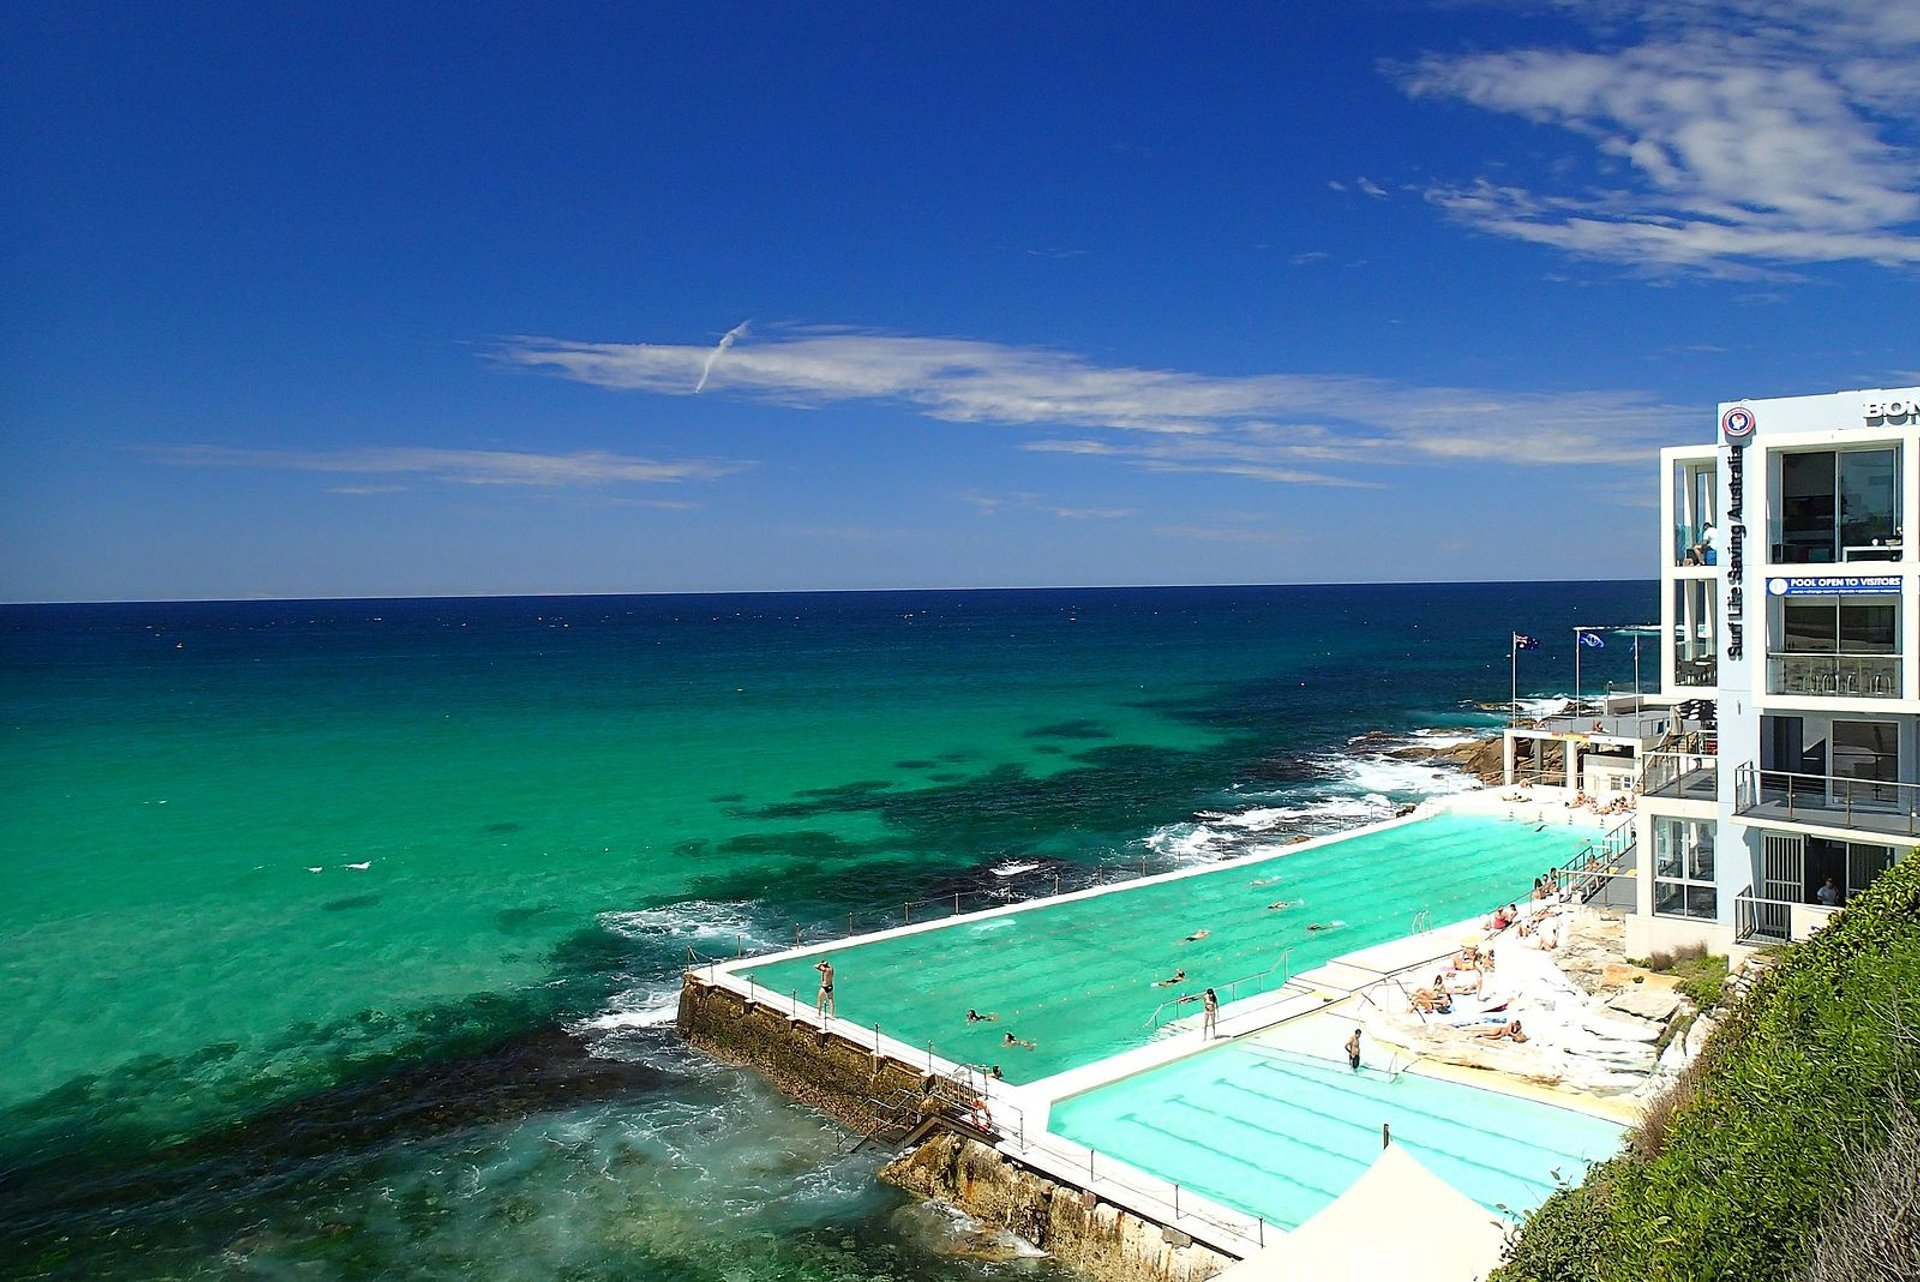 Bondi Icebergs Pool in Sydney 2019 - Best Time